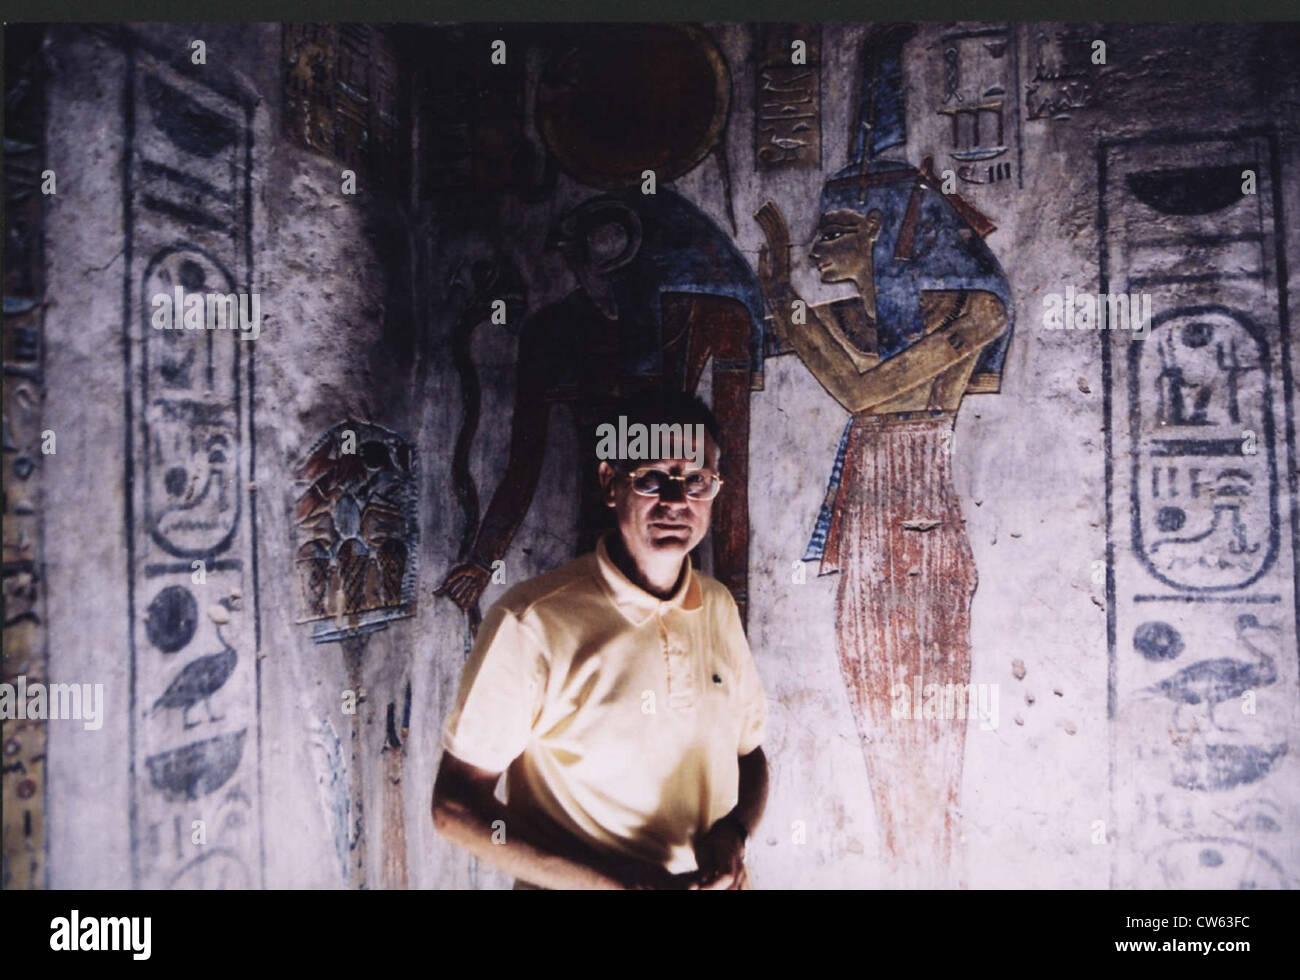 Christian Jacq at Dayr al Madinah site - Stock Image